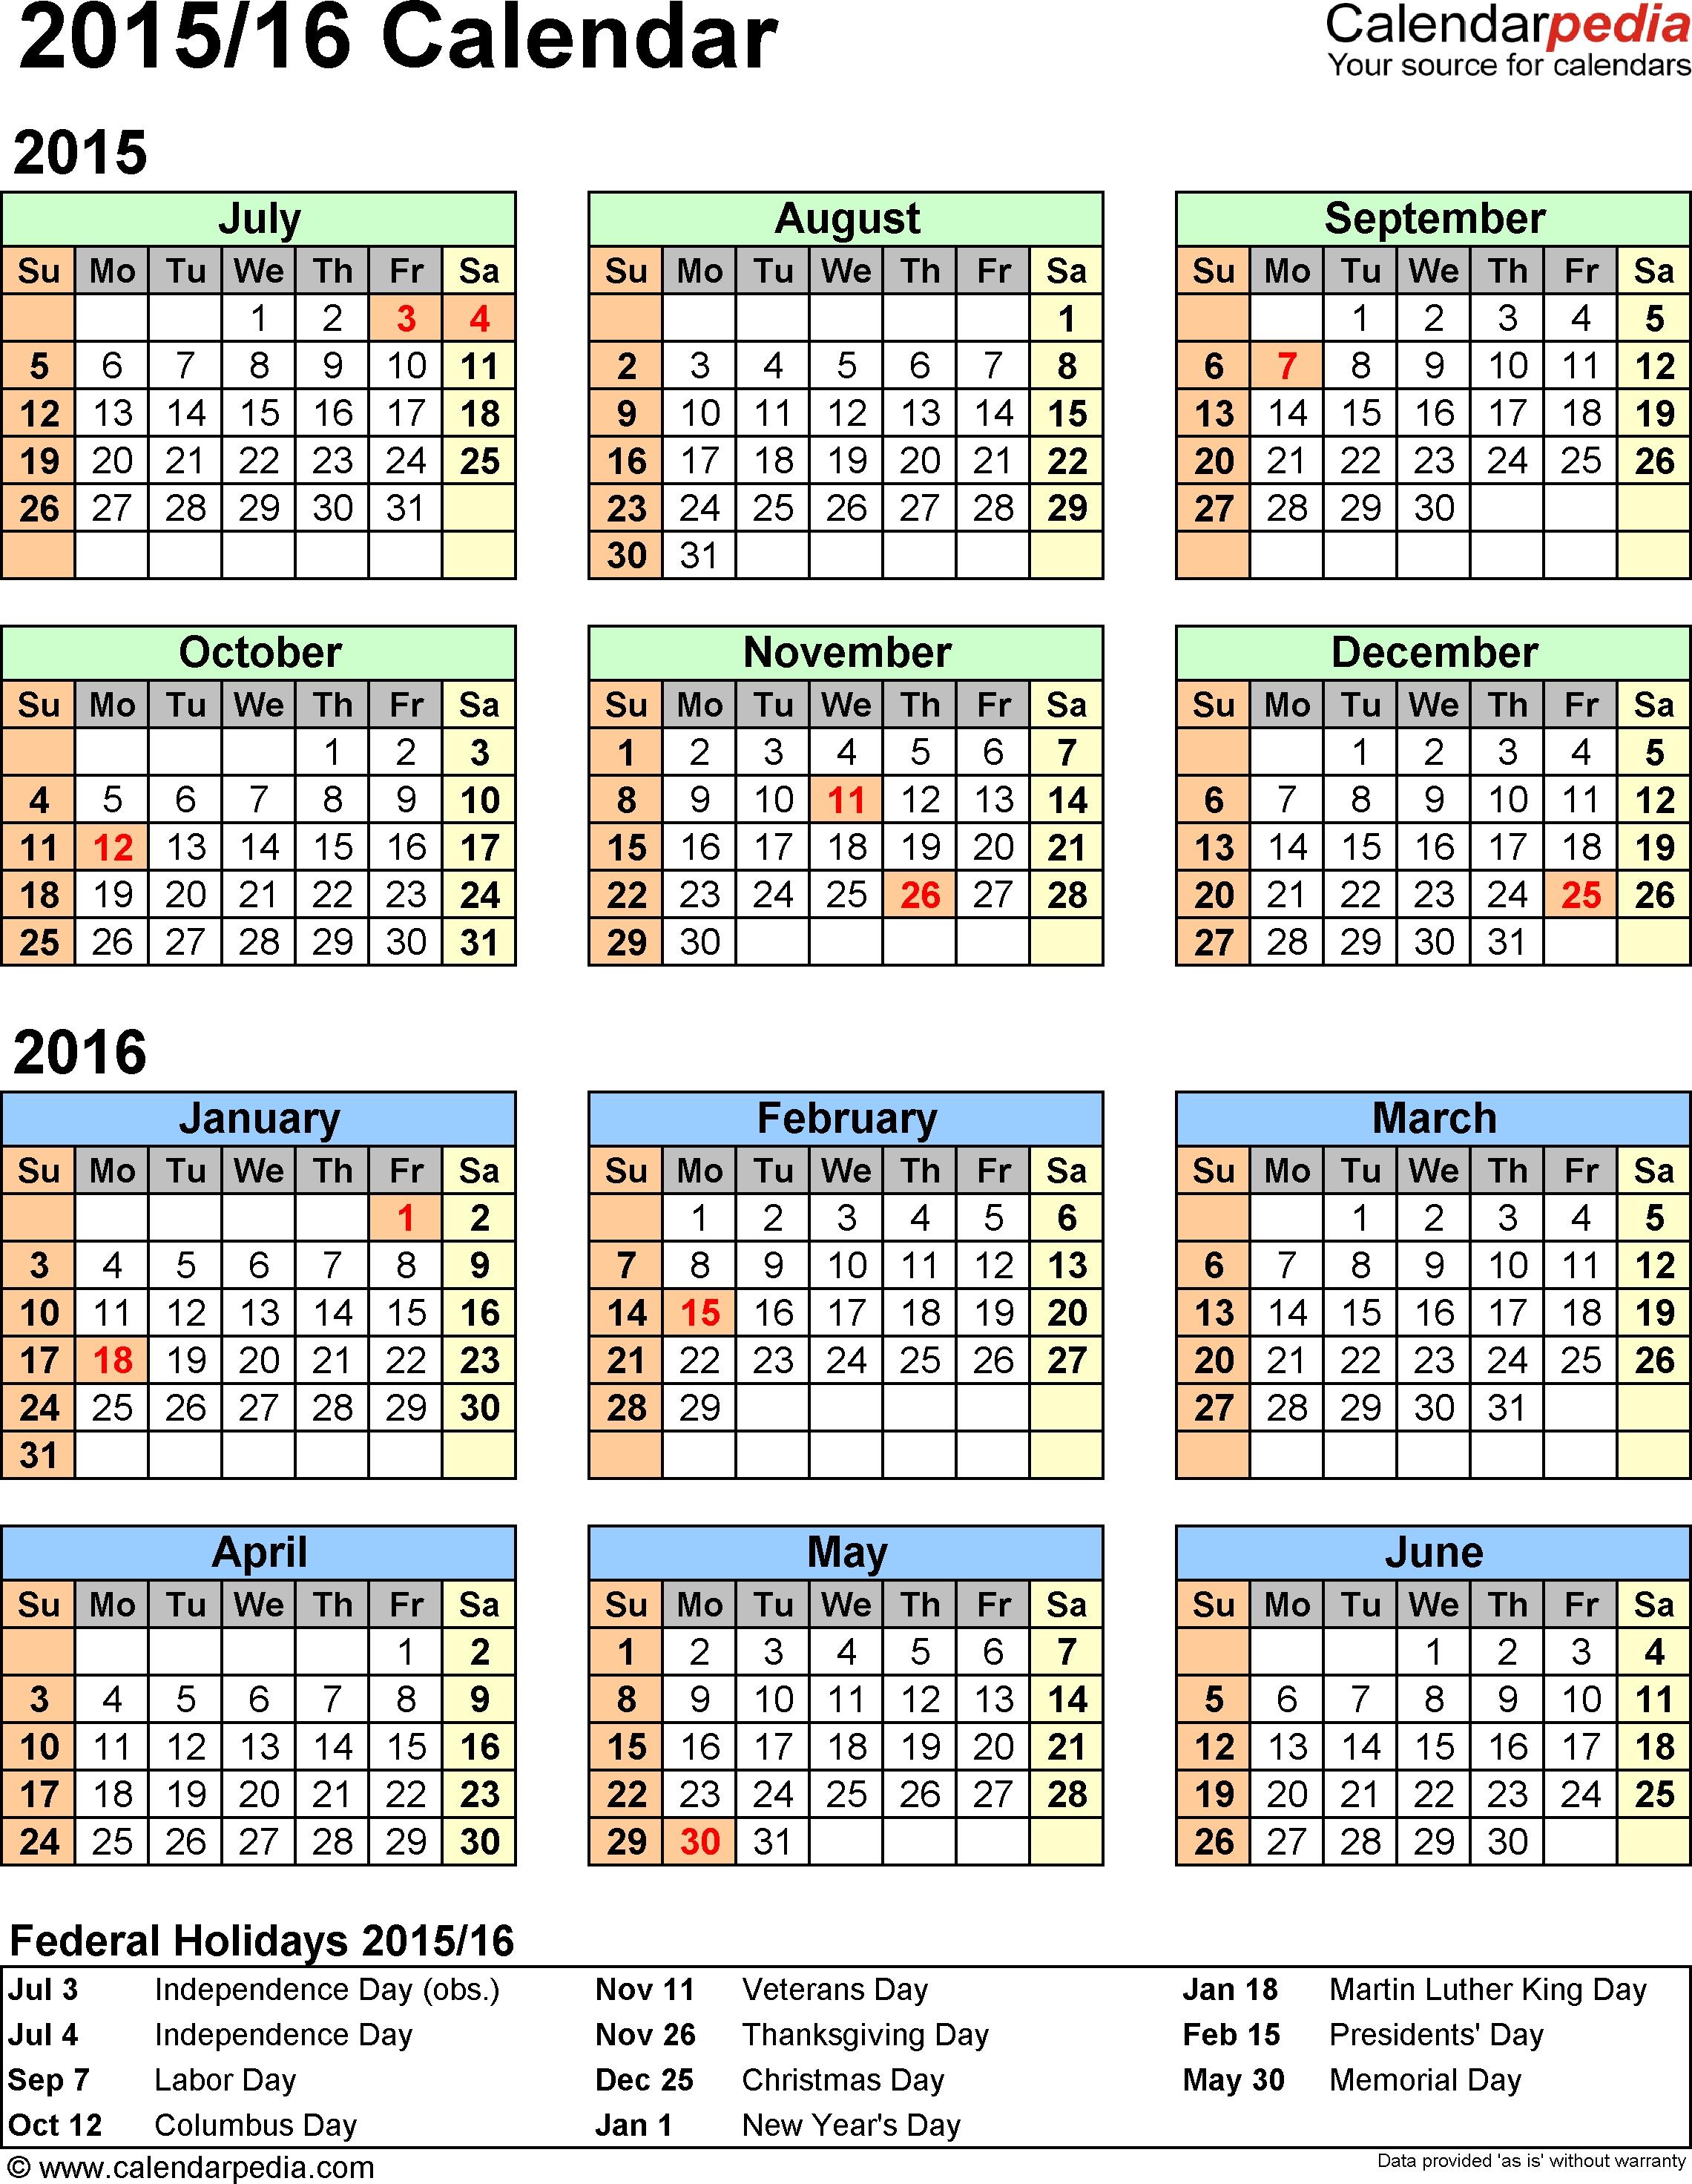 Fiscal Year 2015 Calendar Template - Yeniscale.co  Fiscal Year Vs Calendar Year